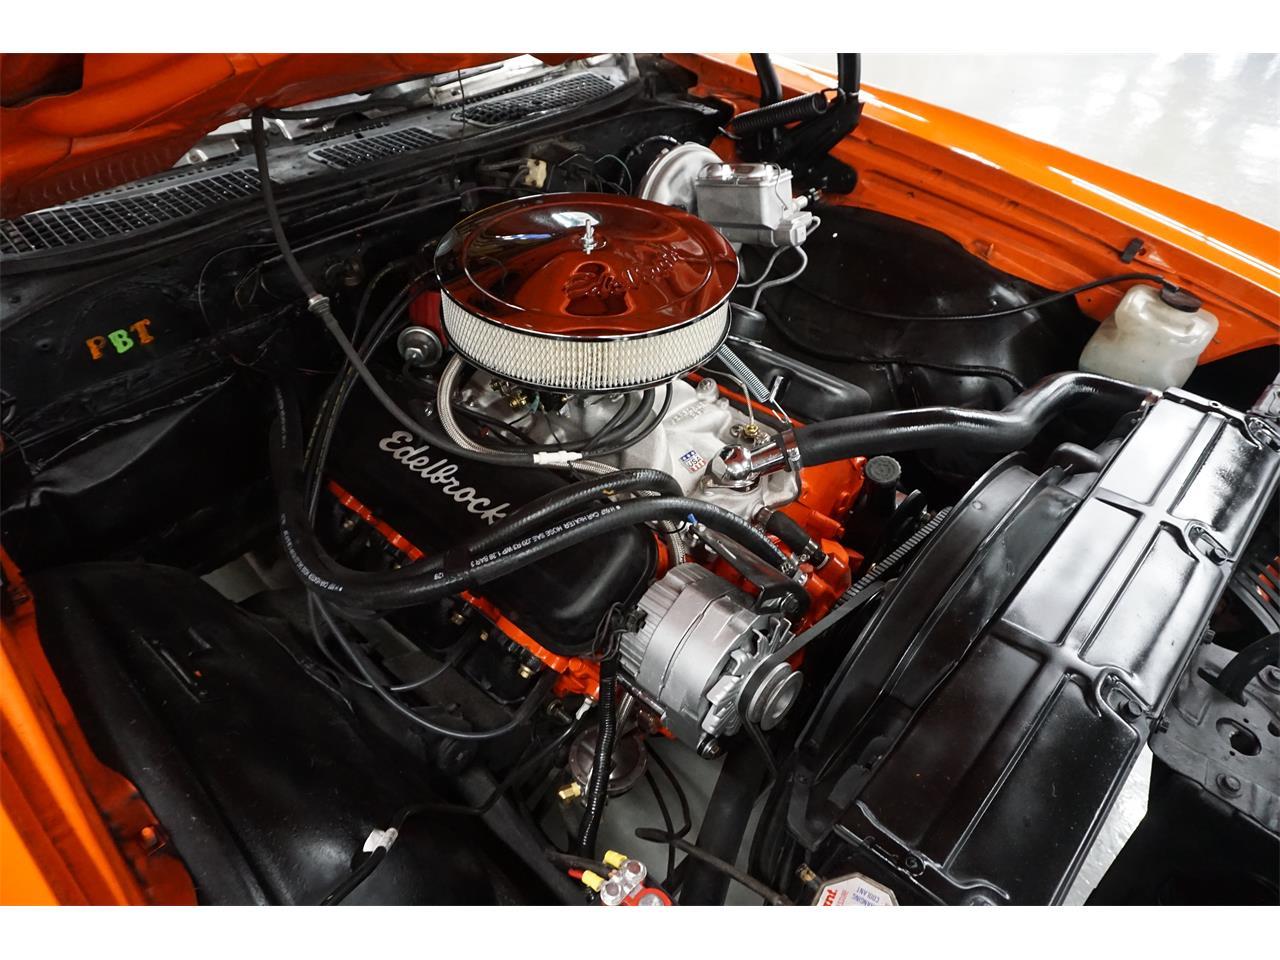 1971 Chevrolet Chevelle (CC-1274693) for sale in Glen Burnie, Maryland